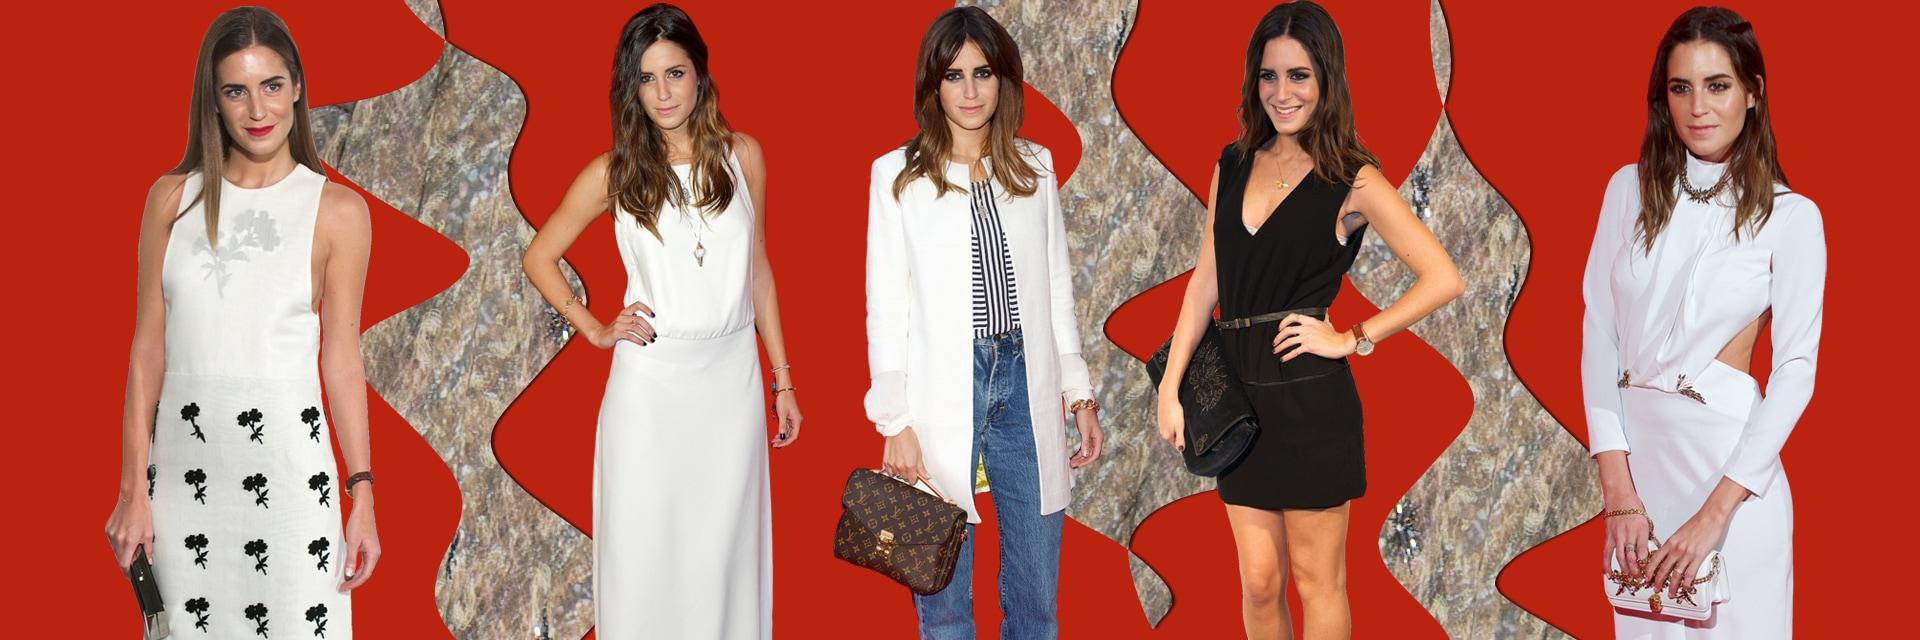 Gala Gonzalez: i suoi look più belli